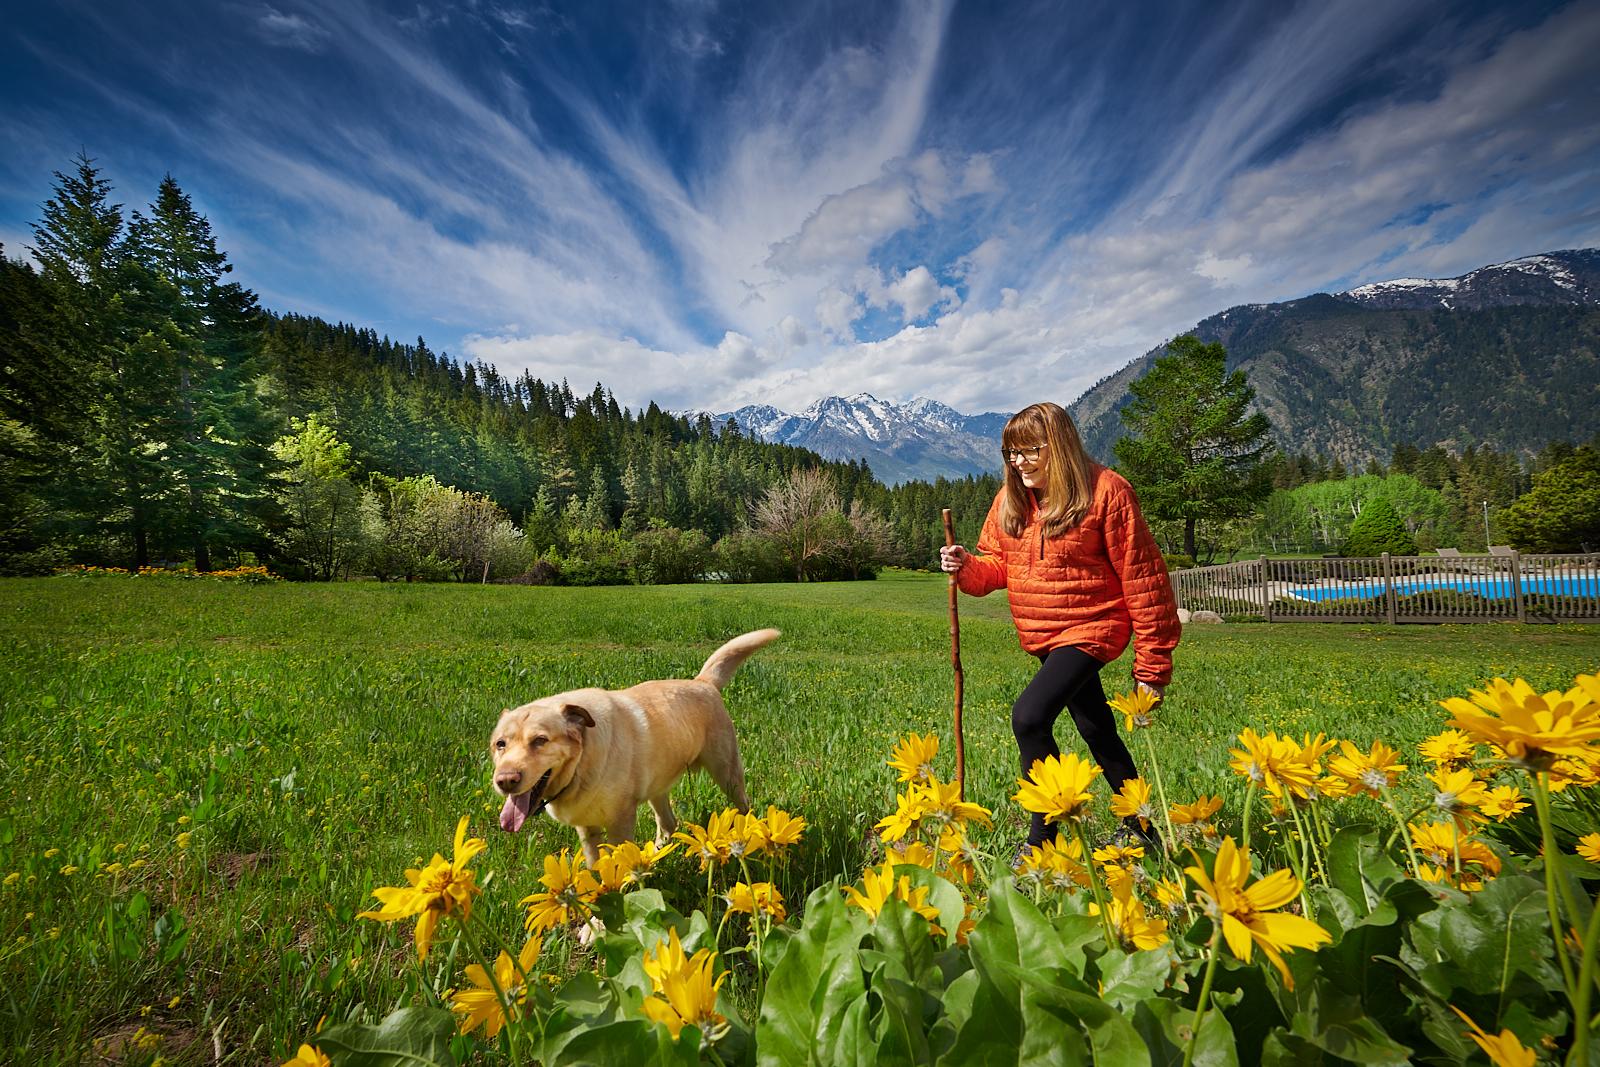 Millie... Trail Dog